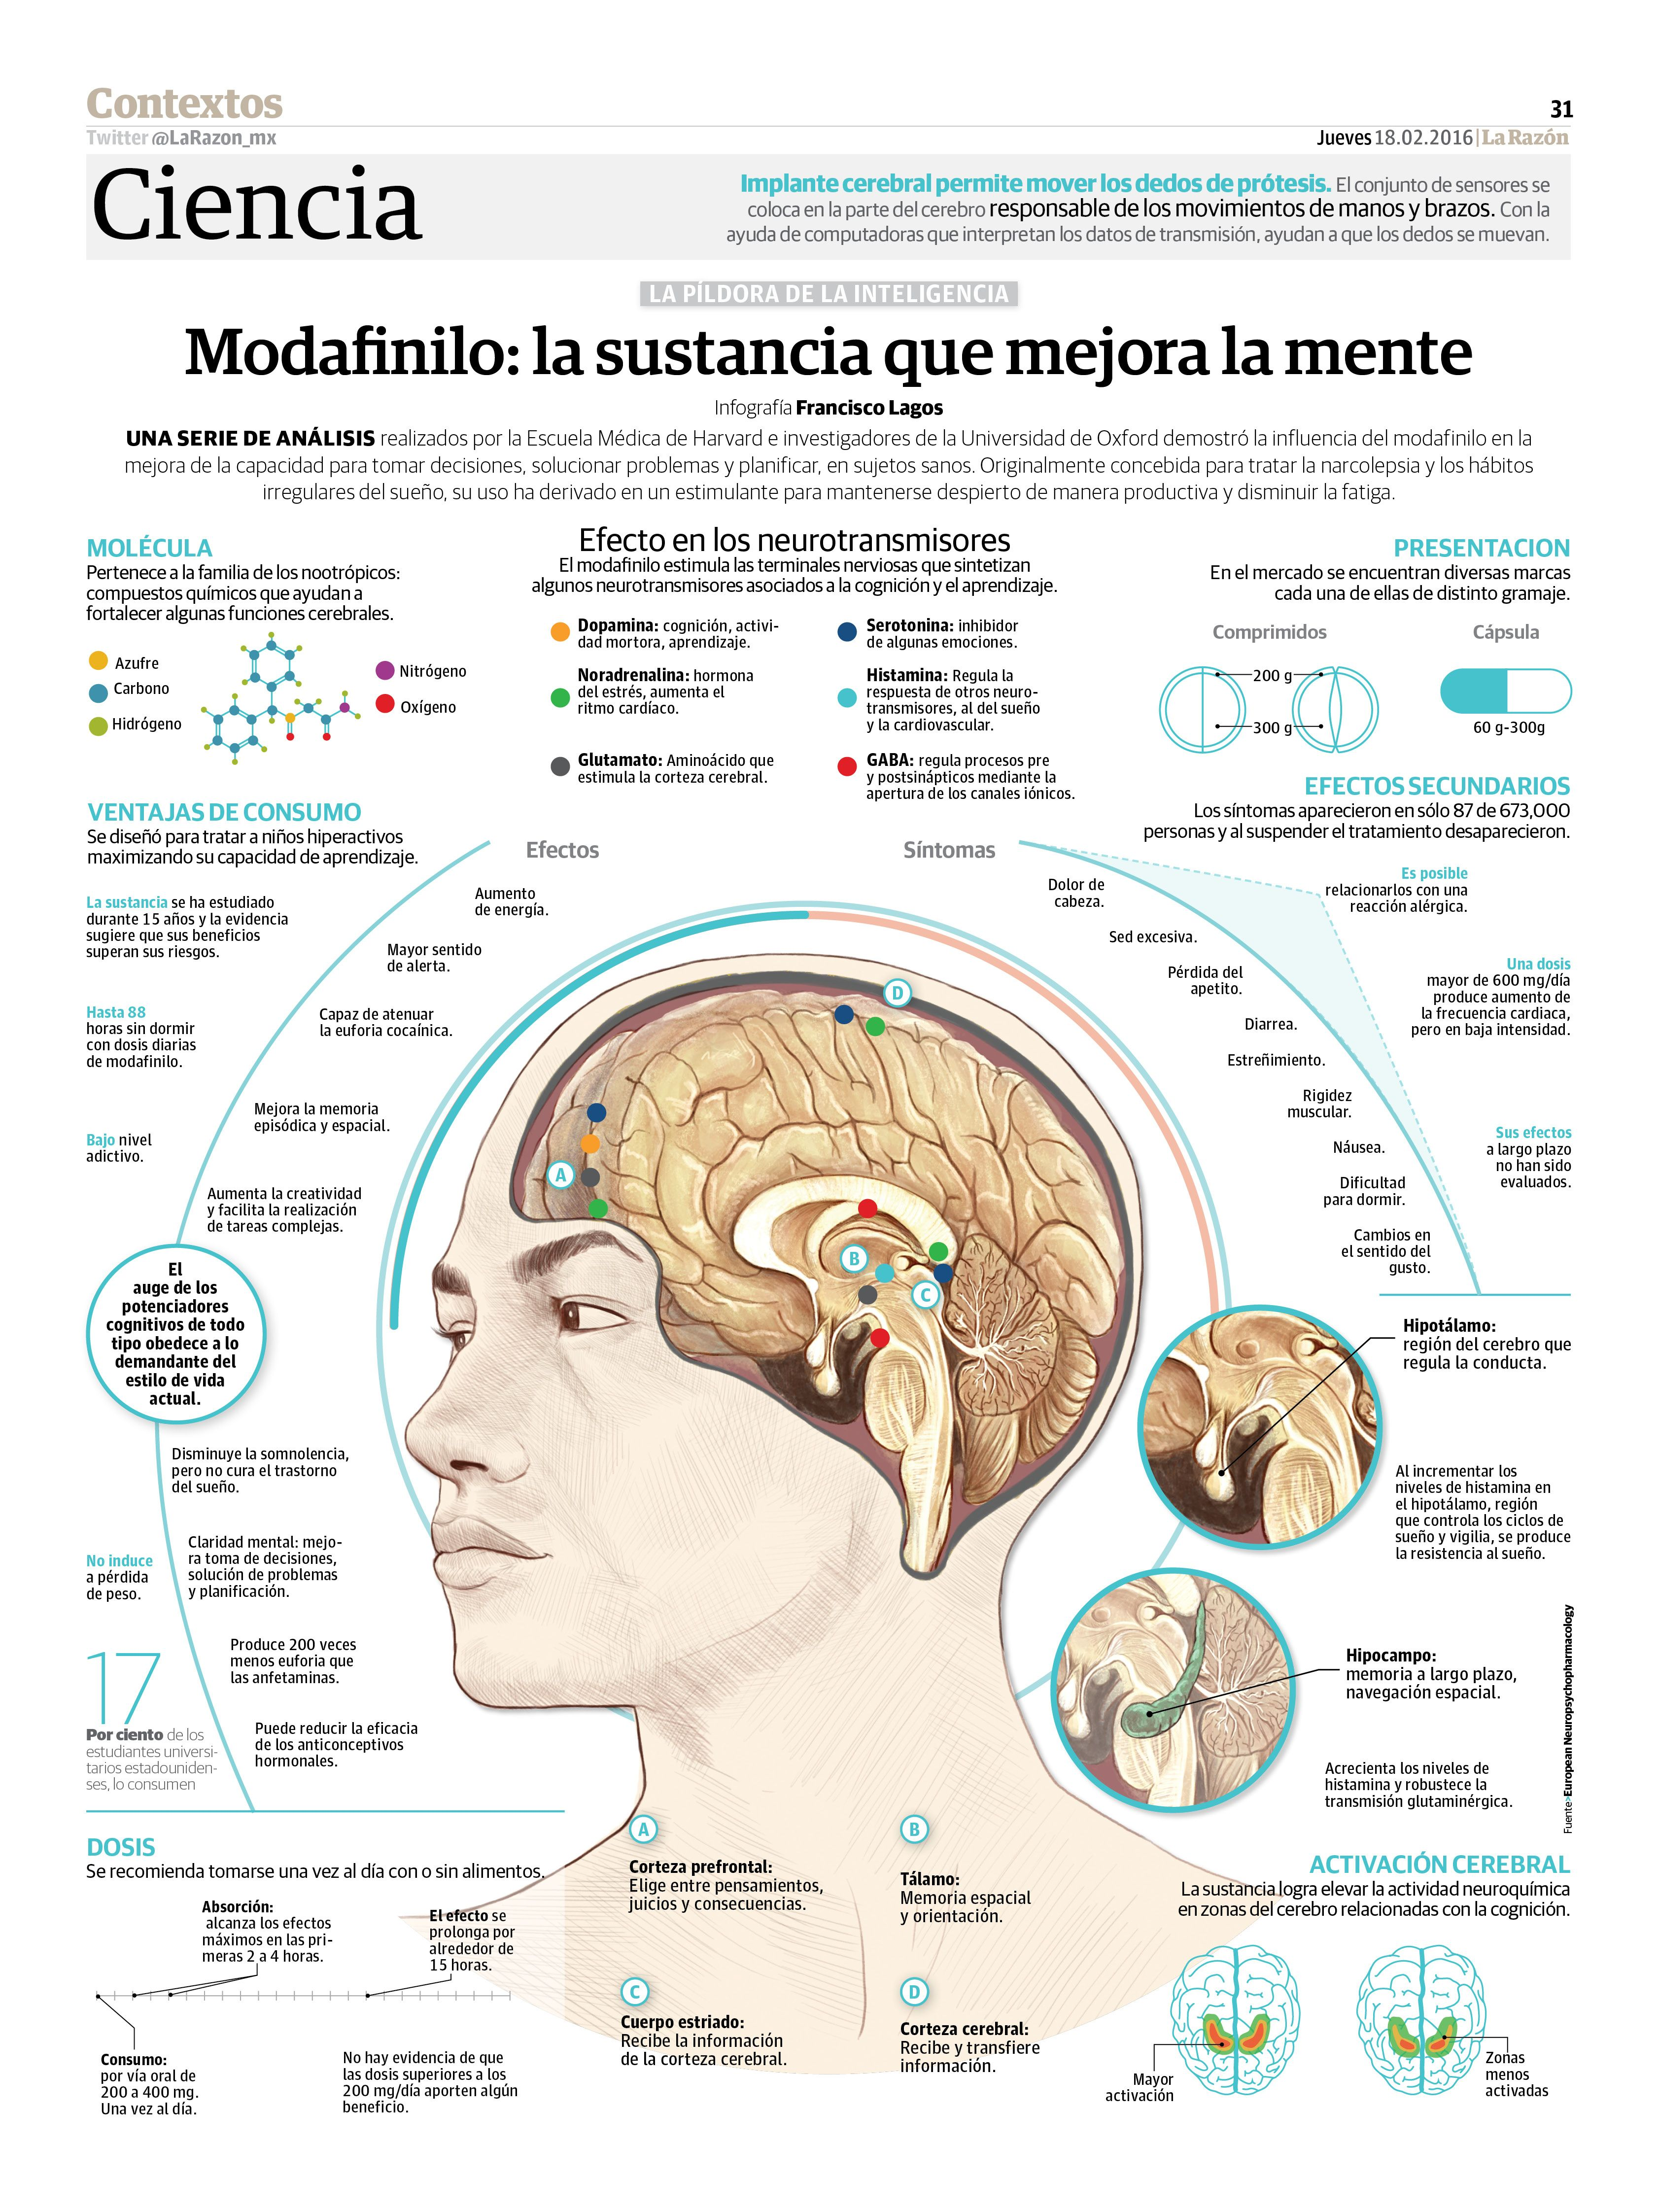 Modafinilo, la pildora de la inteligencia.   Infografías Ciencia ...